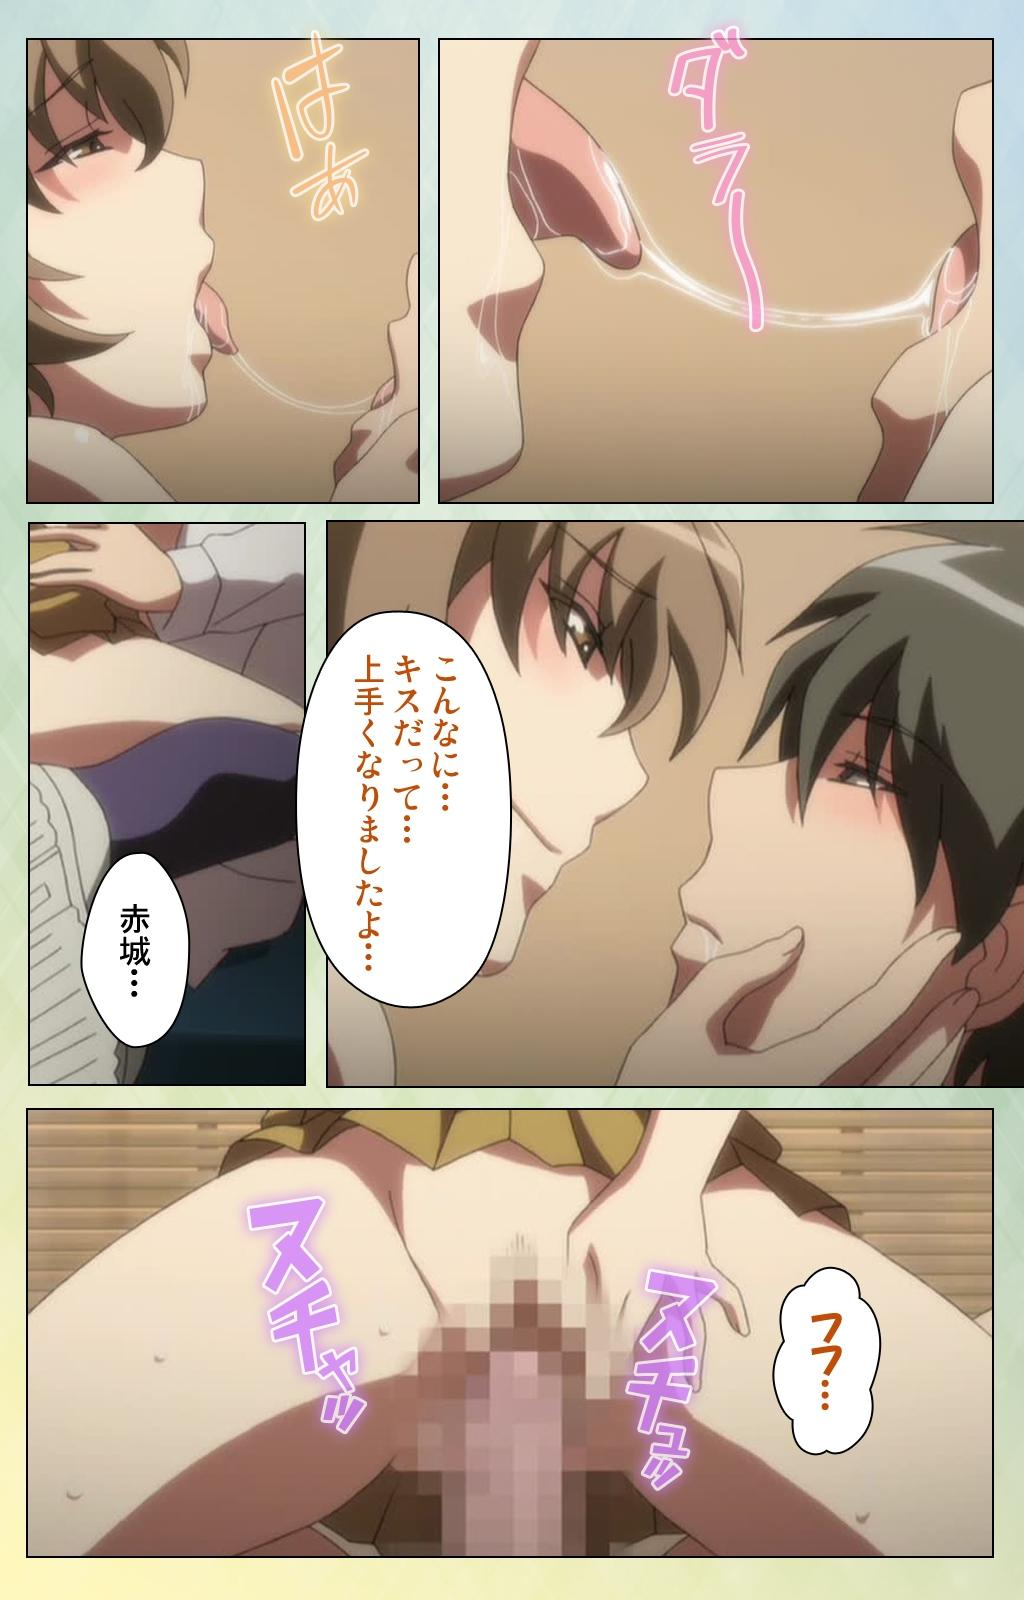 Furueru Kuchibiru fuzzy lips0 Complete Ban 11